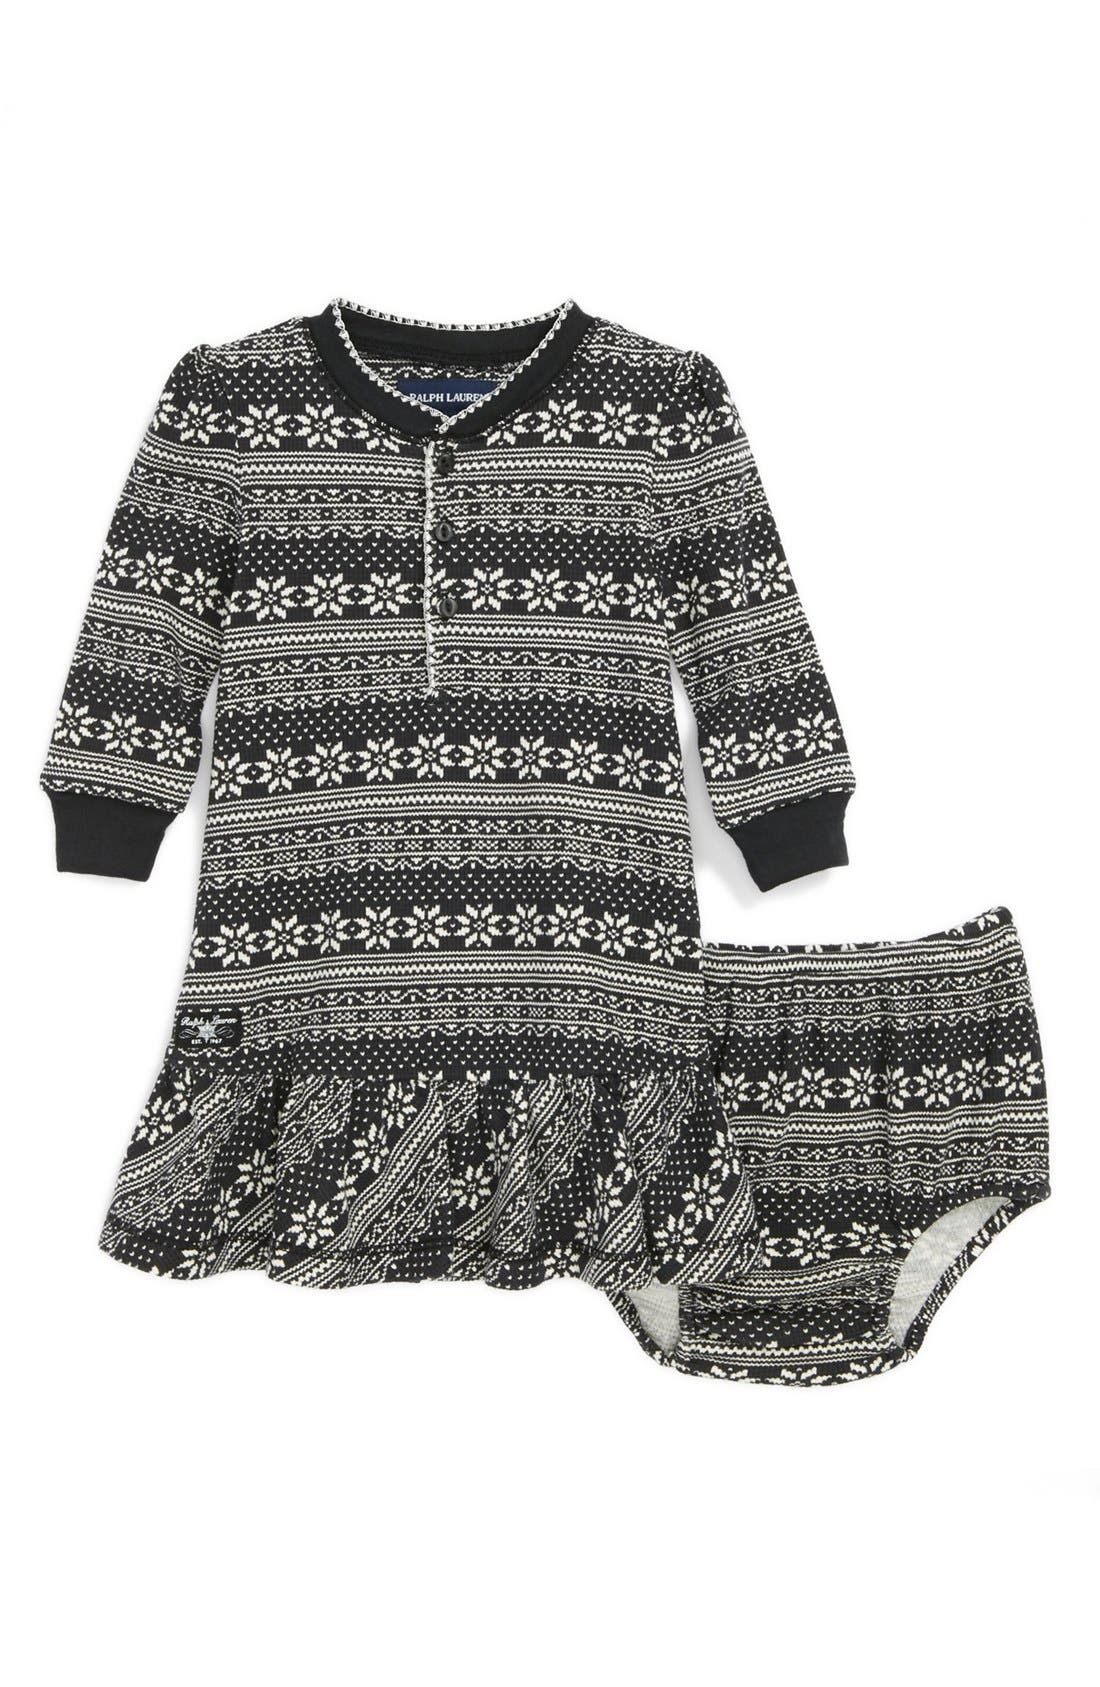 Alternate Image 1 Selected - Ralph Lauren Print Dress & Bloomers (Baby Girls)